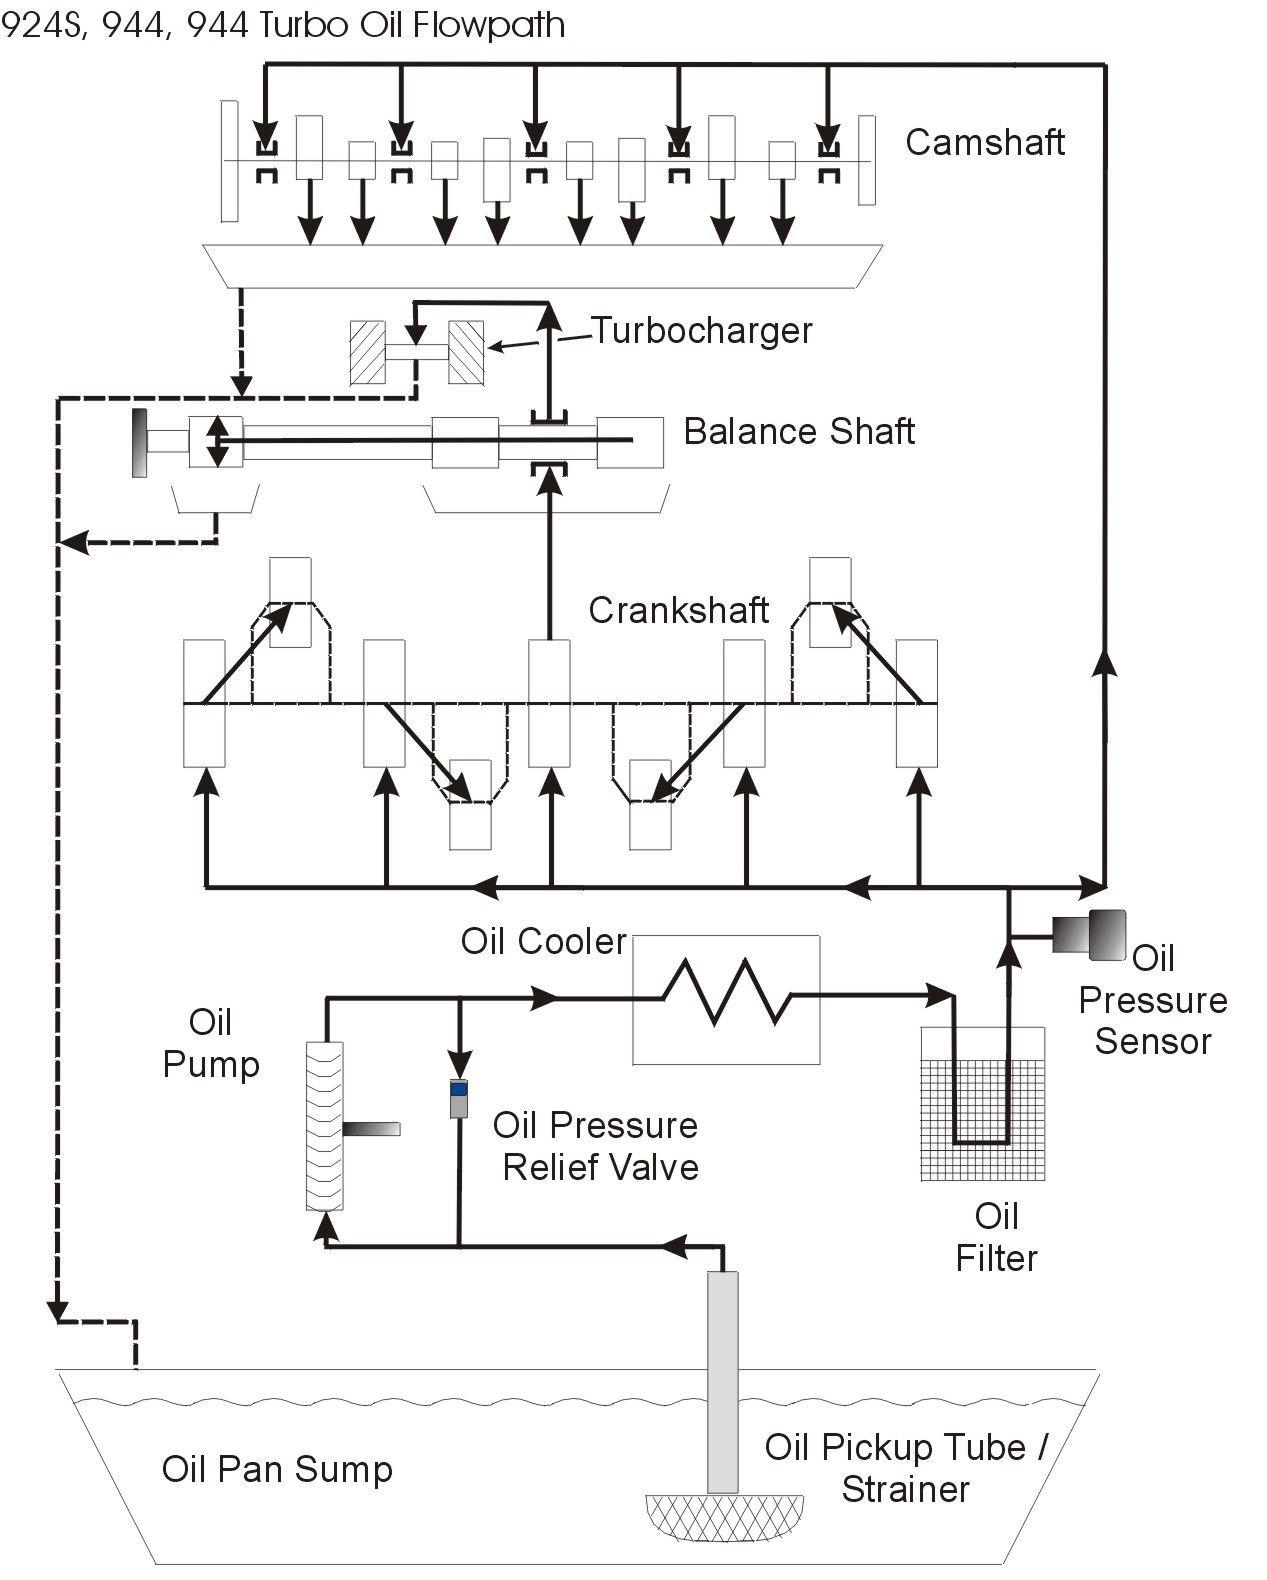 hight resolution of oil flow diagram 944 porsche porsche 944 cars car engine oil flow diagram